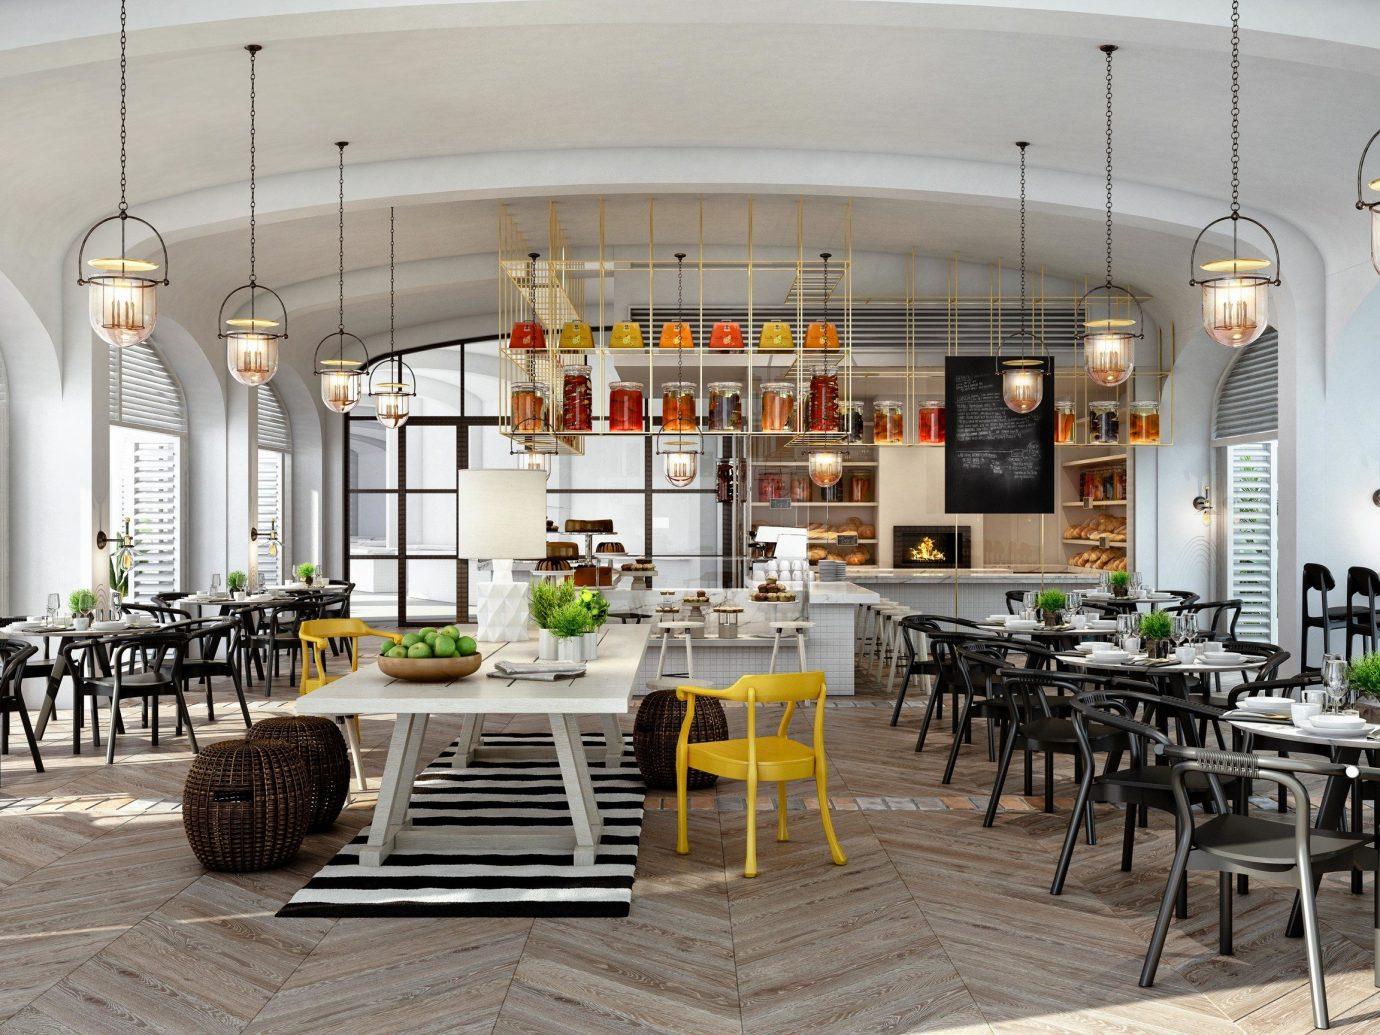 Trip Ideas indoor restaurant interior design café several